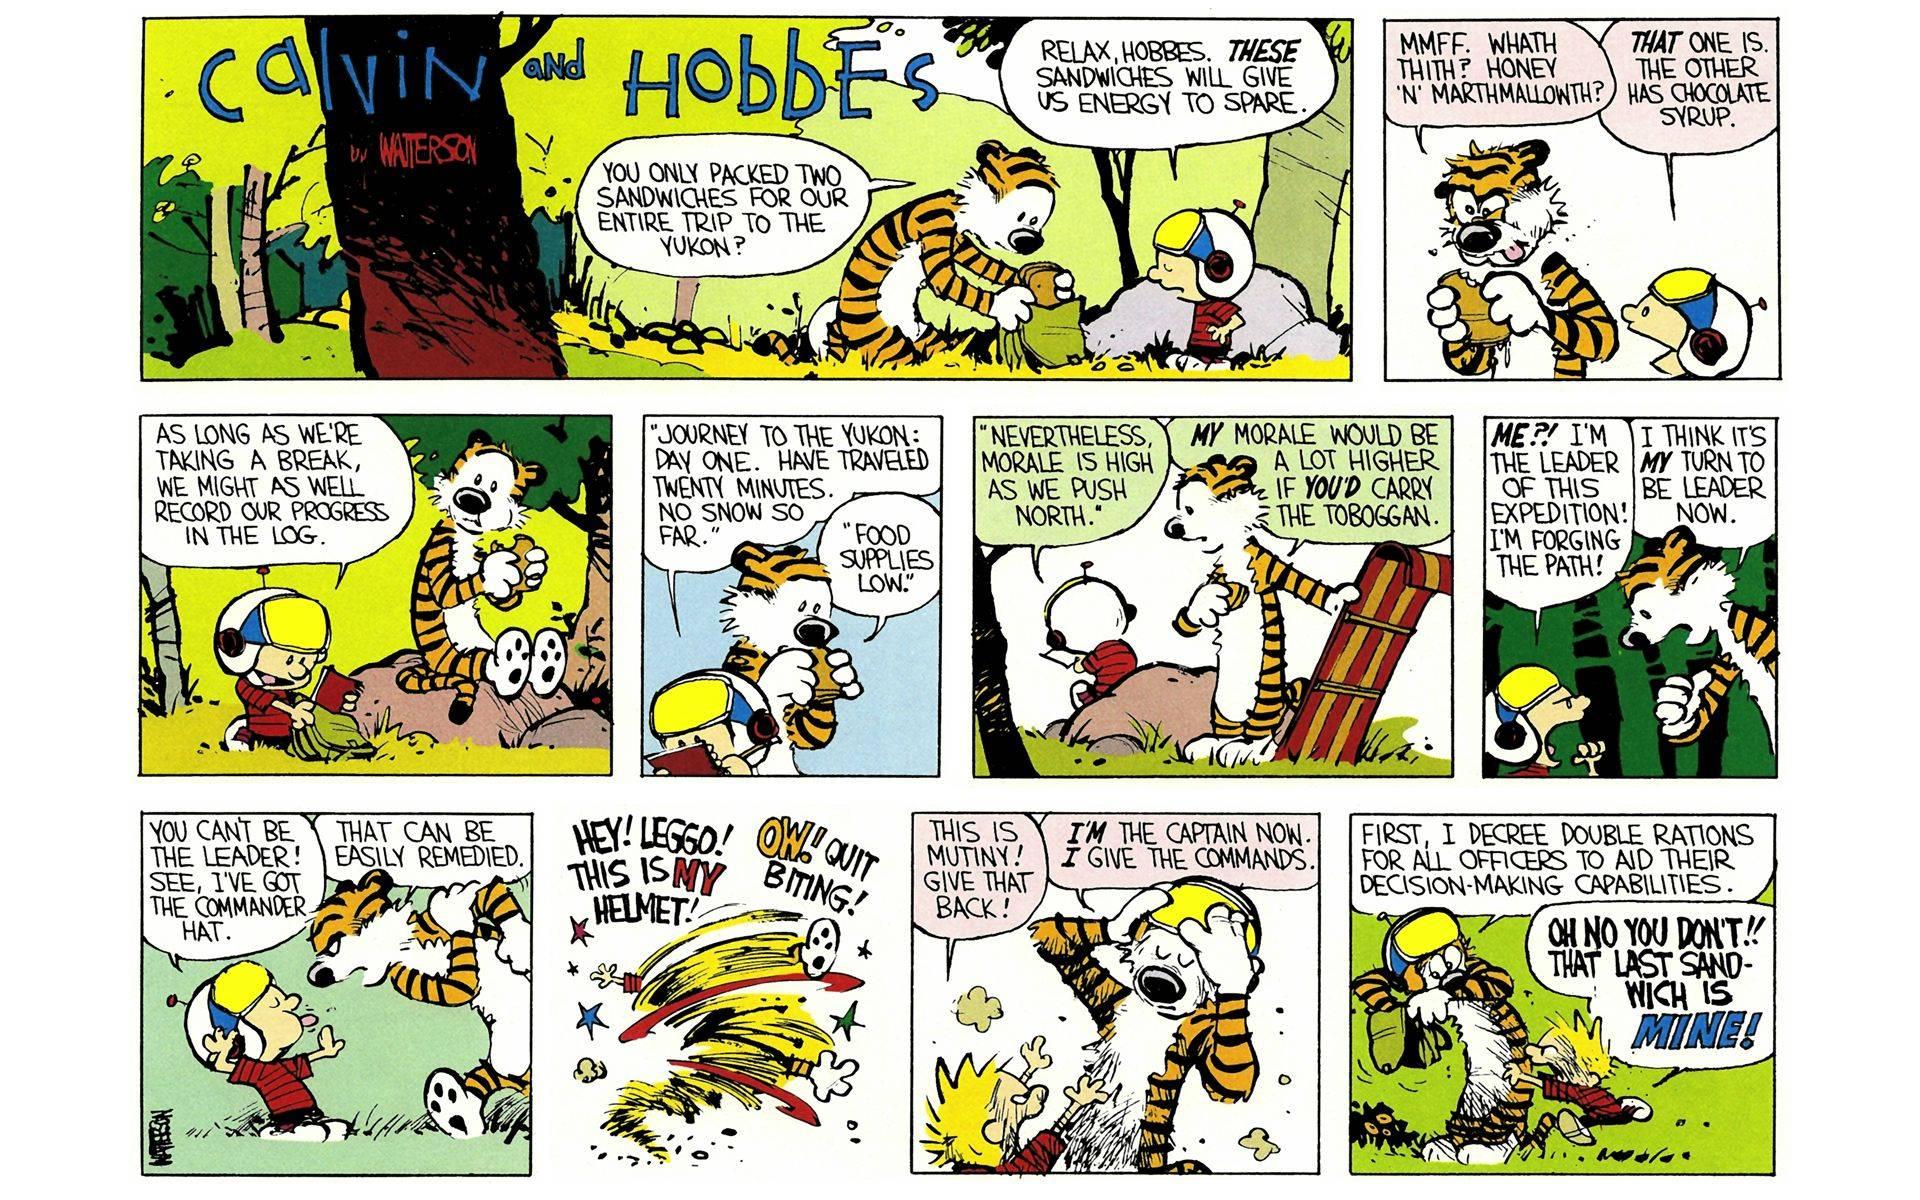 Calvin and Hobbes Yukon Ho! review